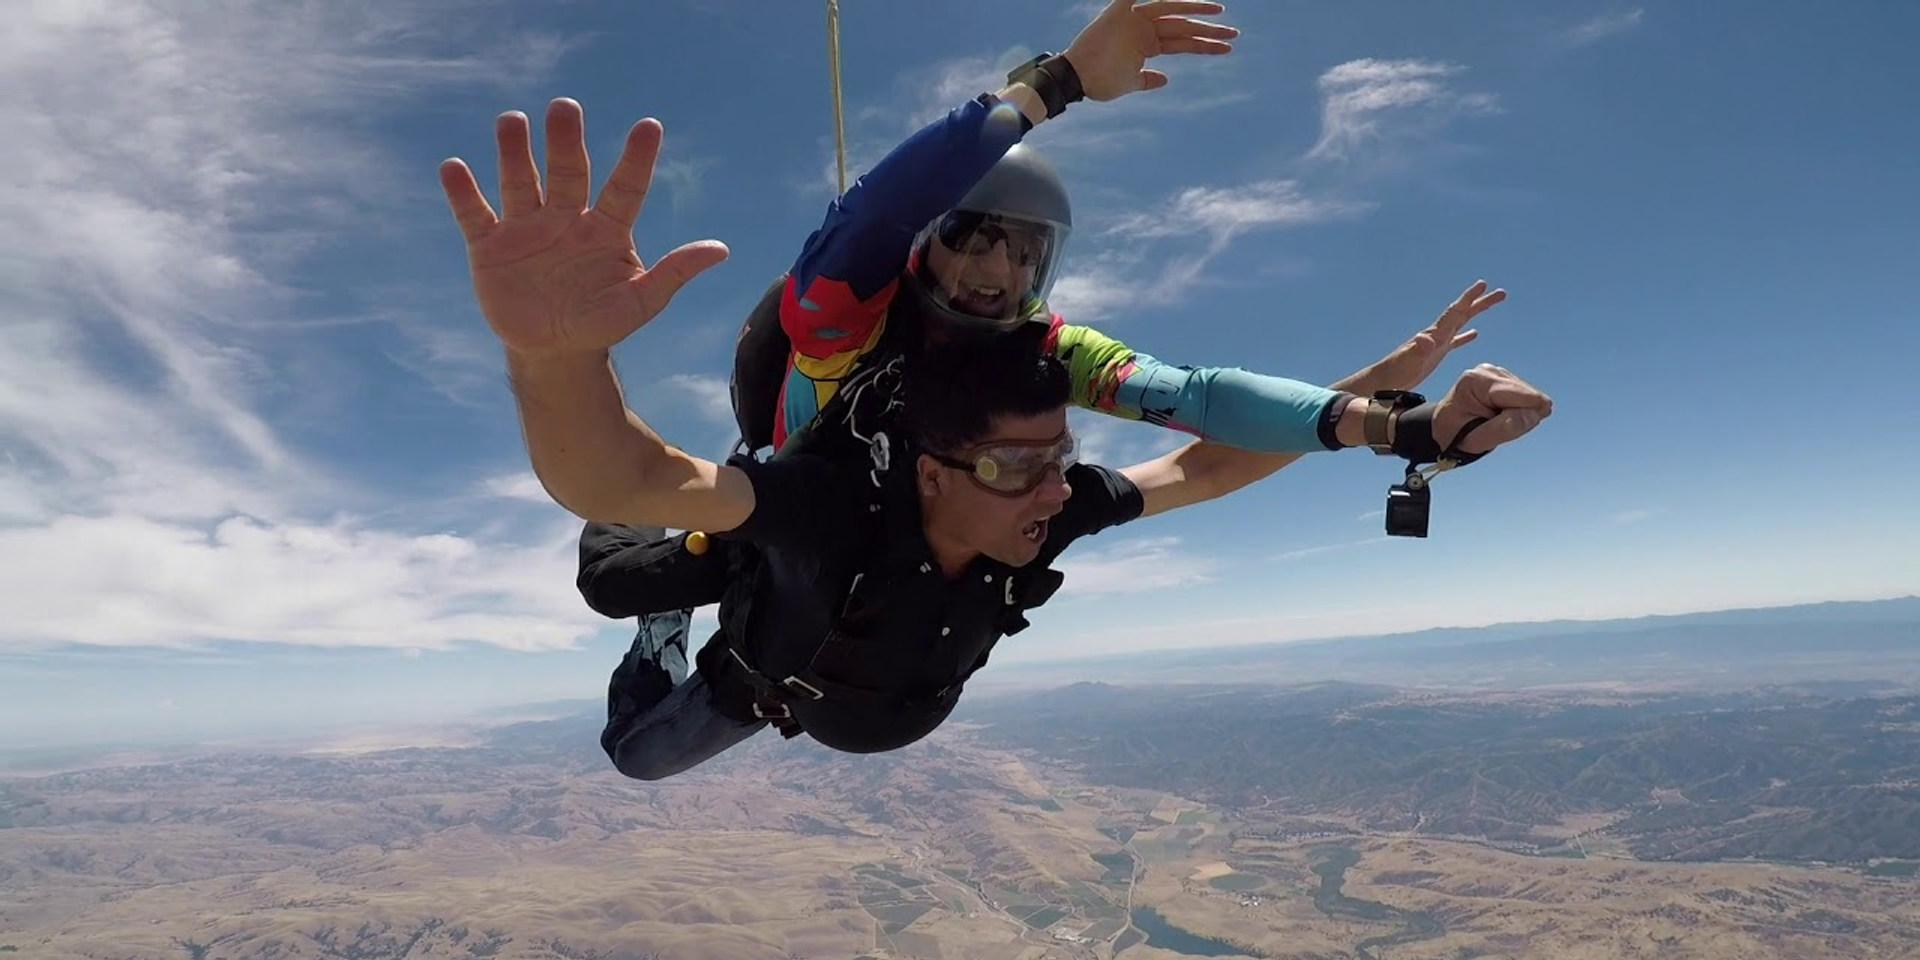 Ramesh's June 2019 First Tandem Skydive in Hollister, CA